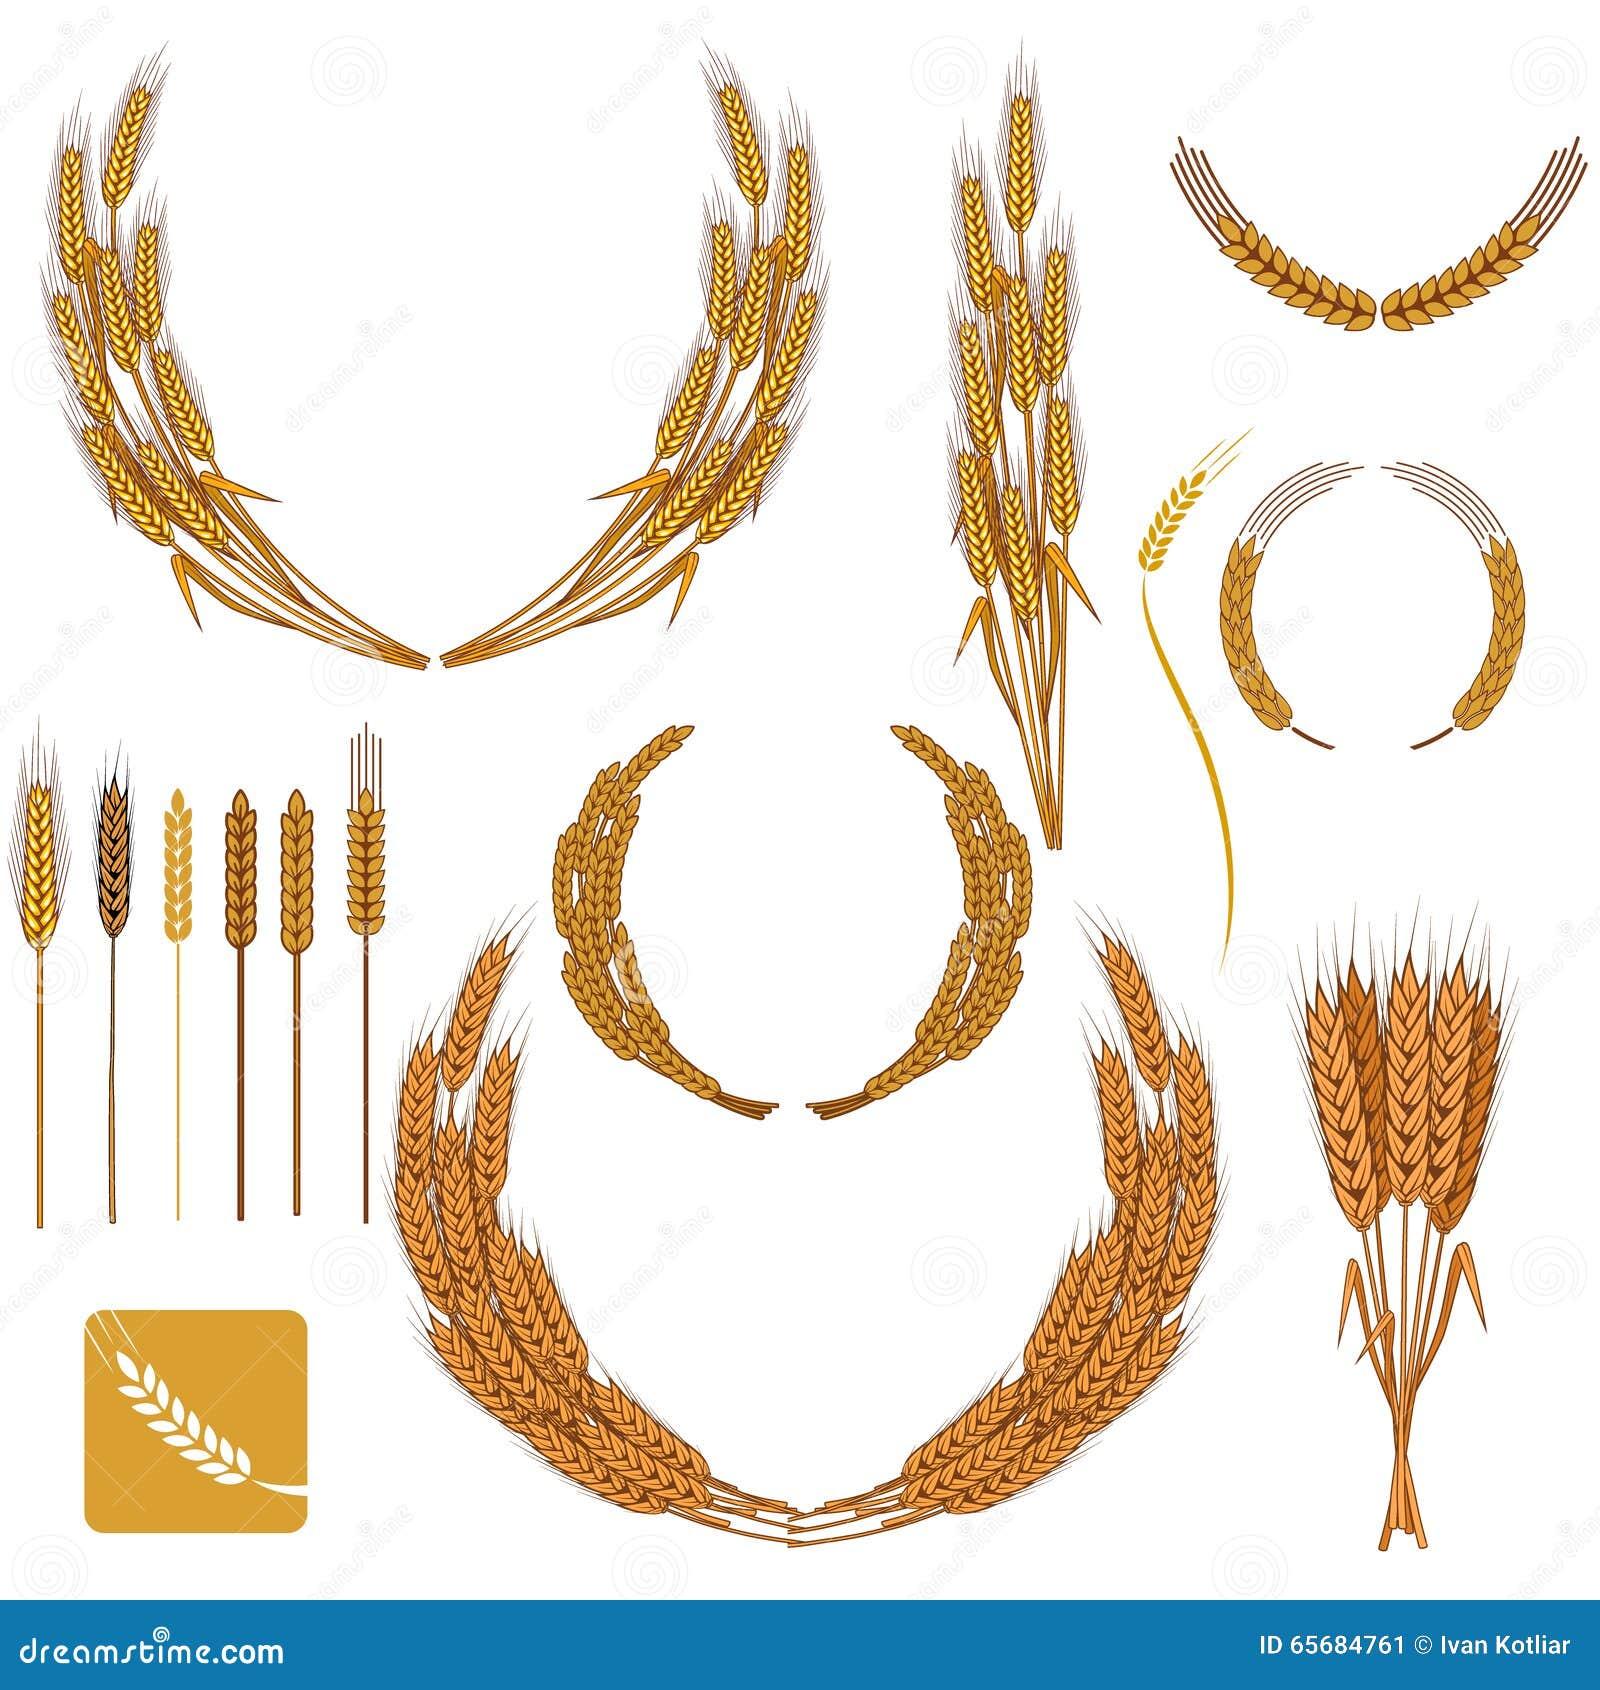 Bakery Logo Emblem Set:  Set Of Wheat Wreath And Design Elements. Stock Vector